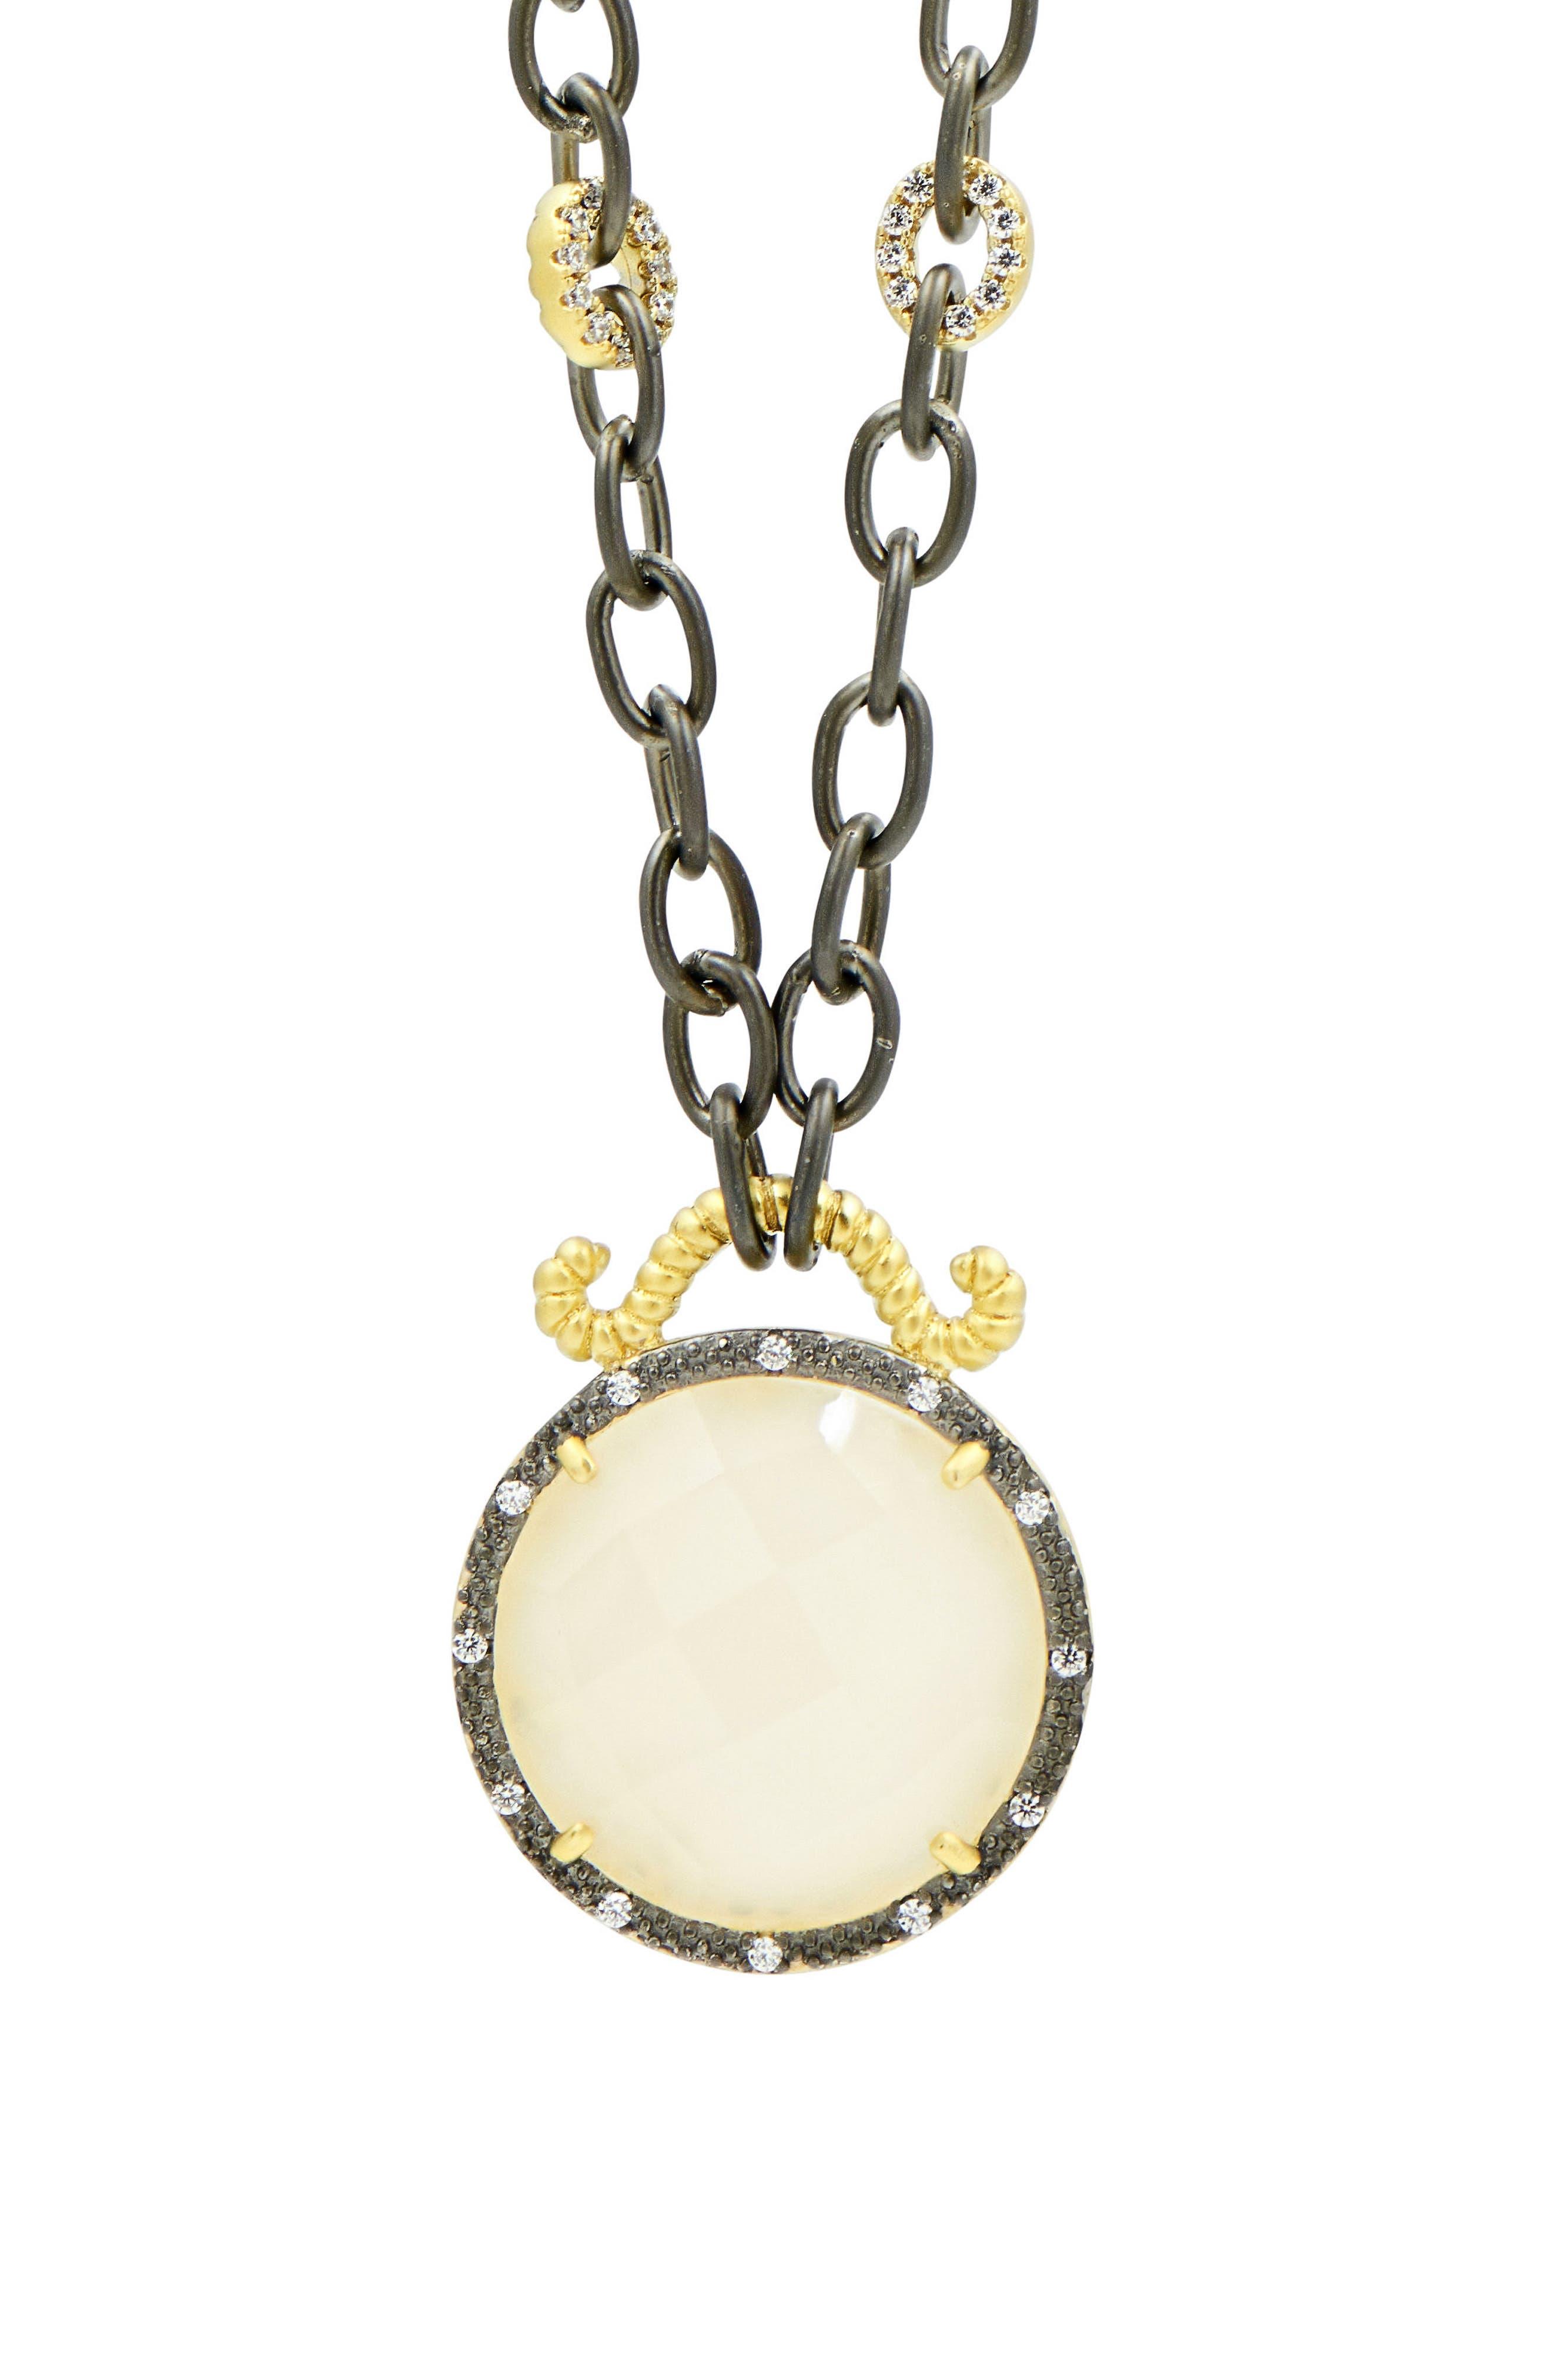 Gilded Cable Reversible Pendant Necklace,                             Alternate thumbnail 7, color,                             Black/ Gold